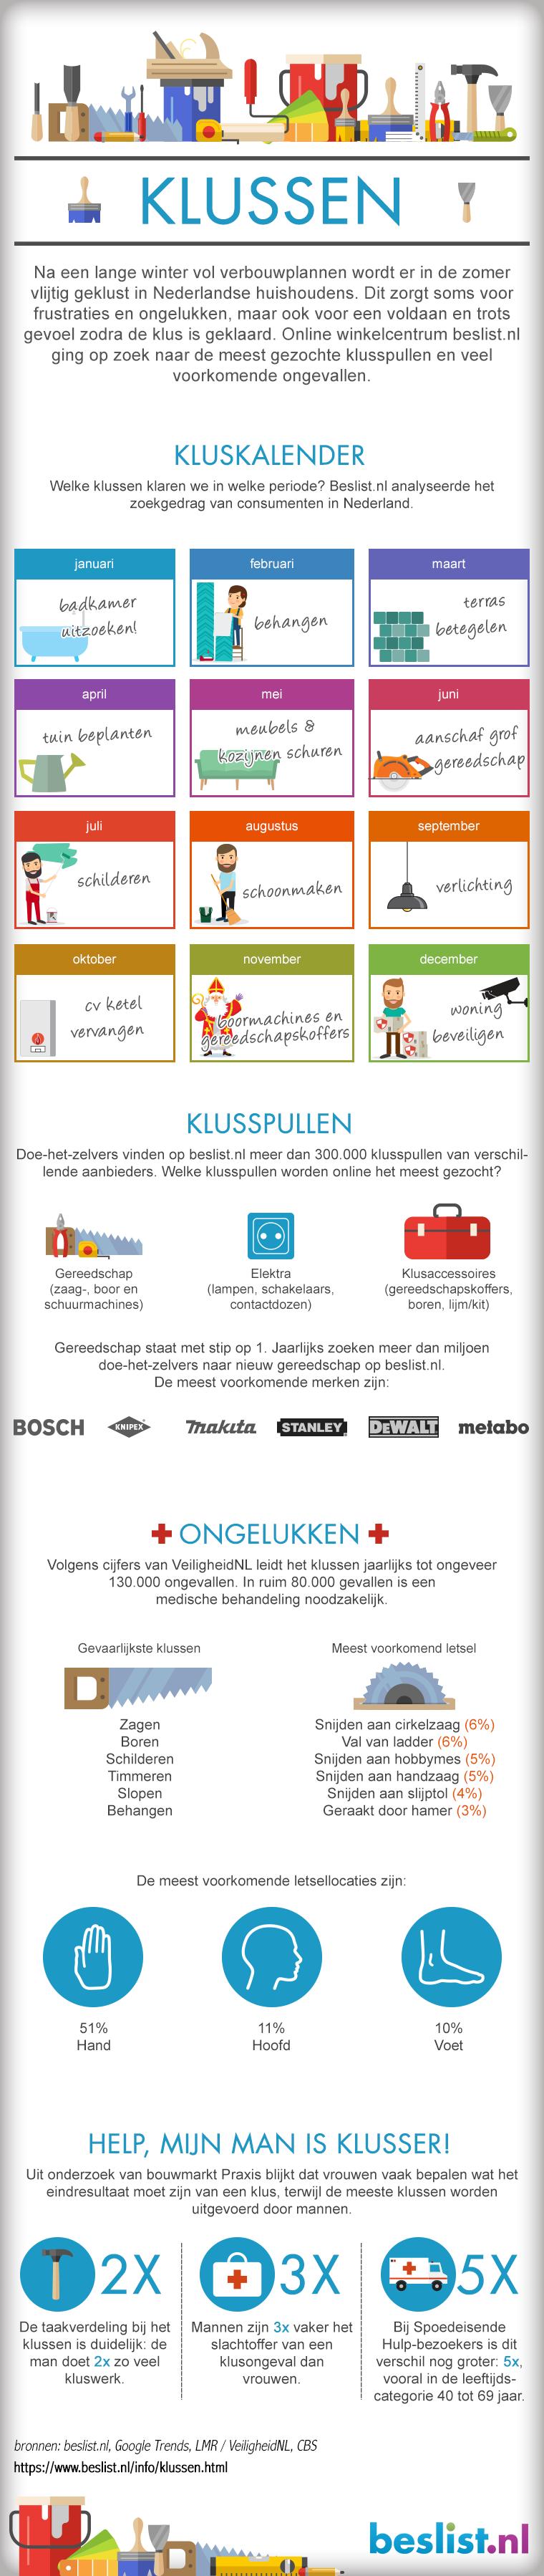 Infographic Klussen